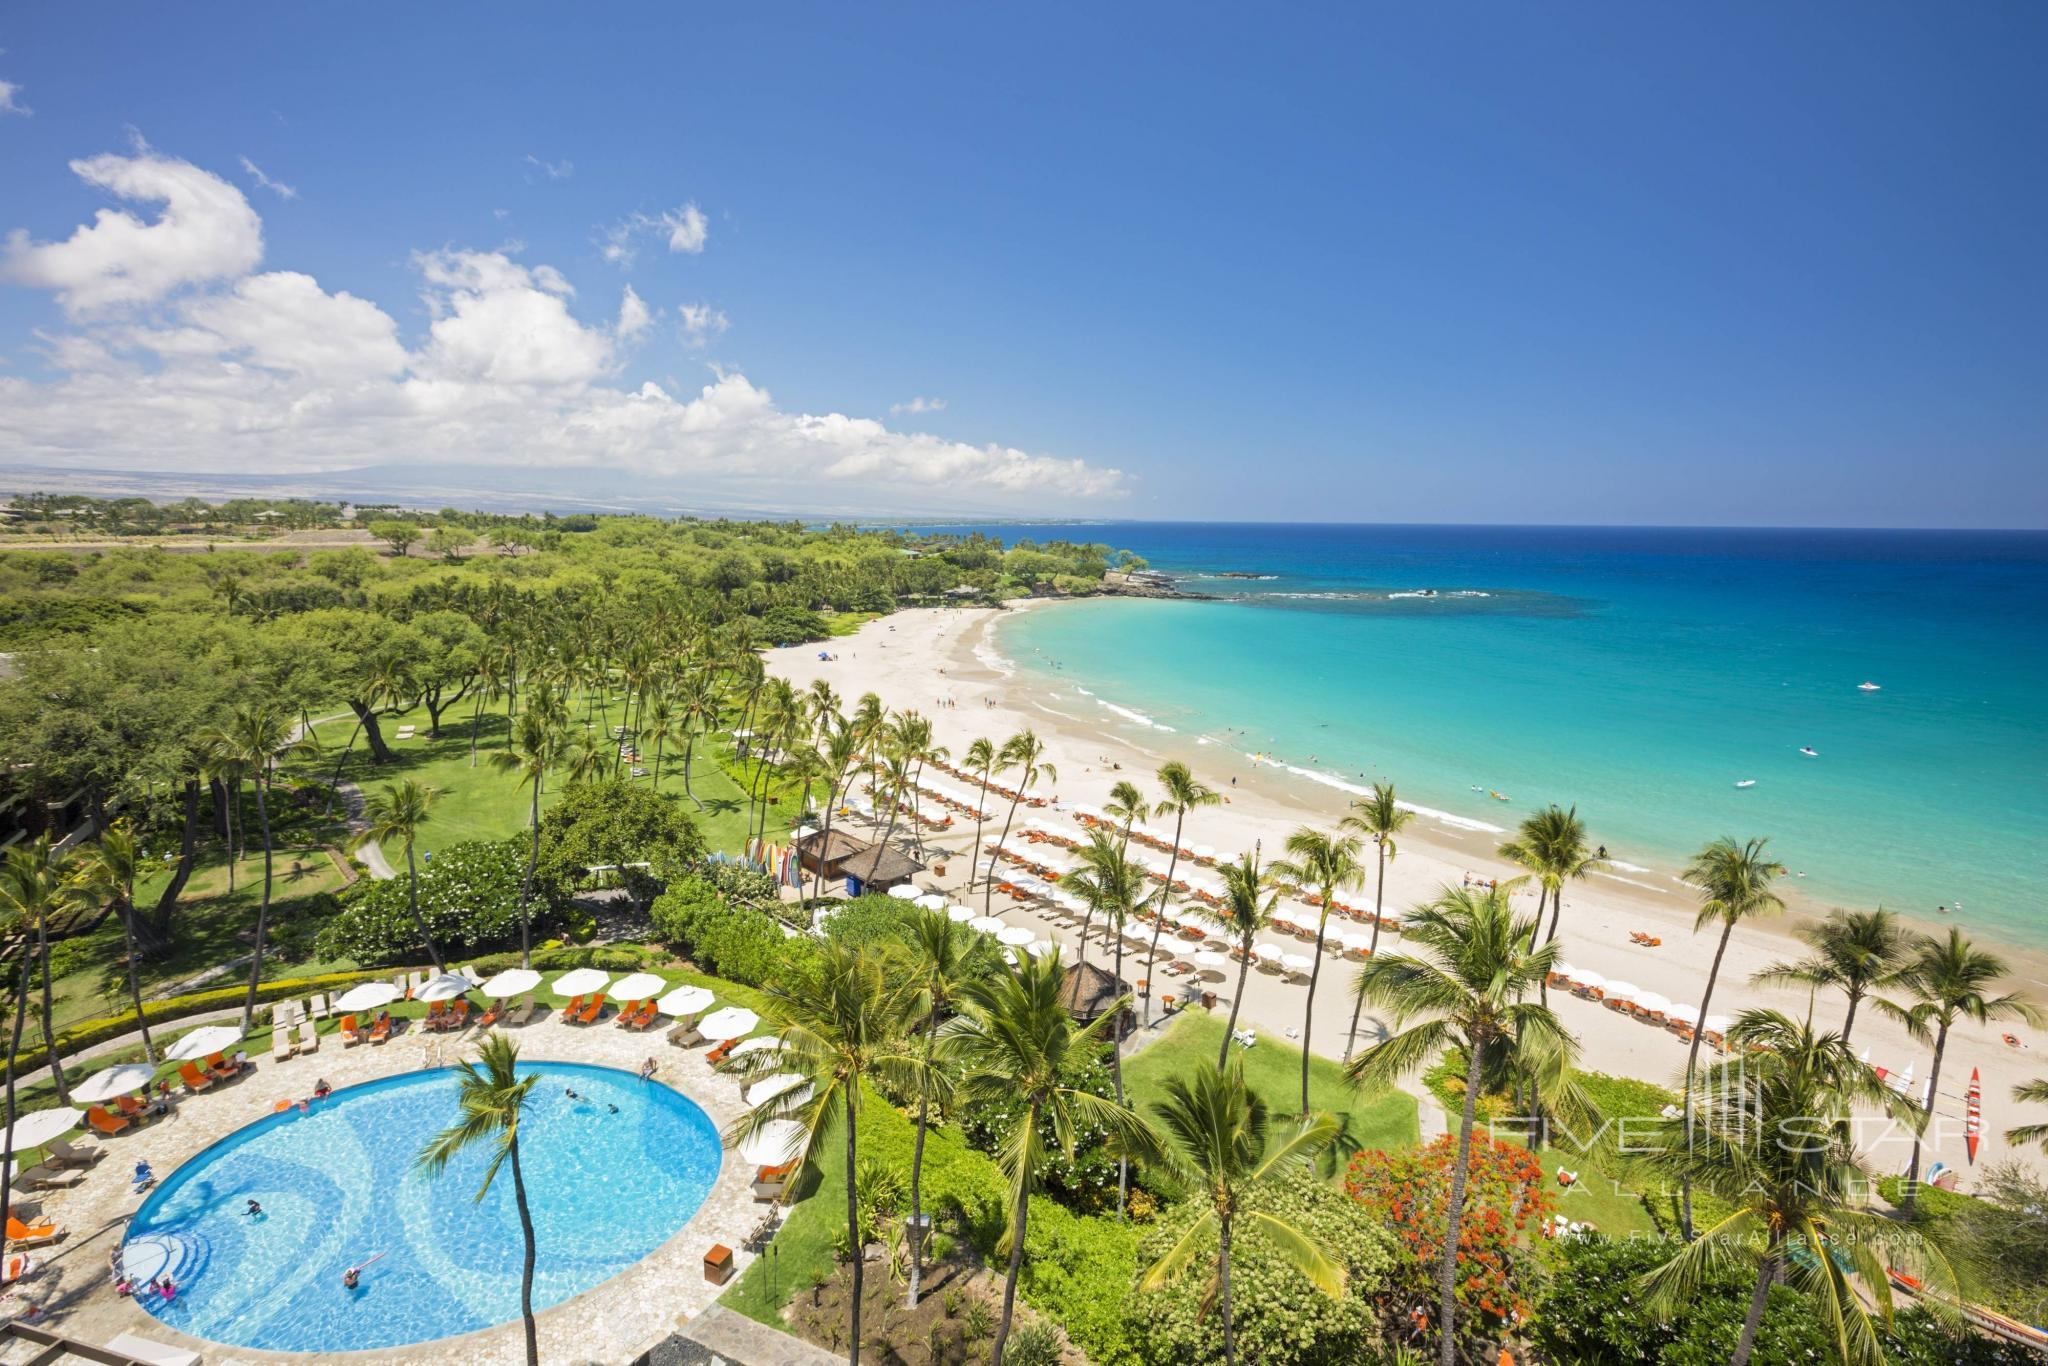 Pool at Mauna Kea Beach Hotel